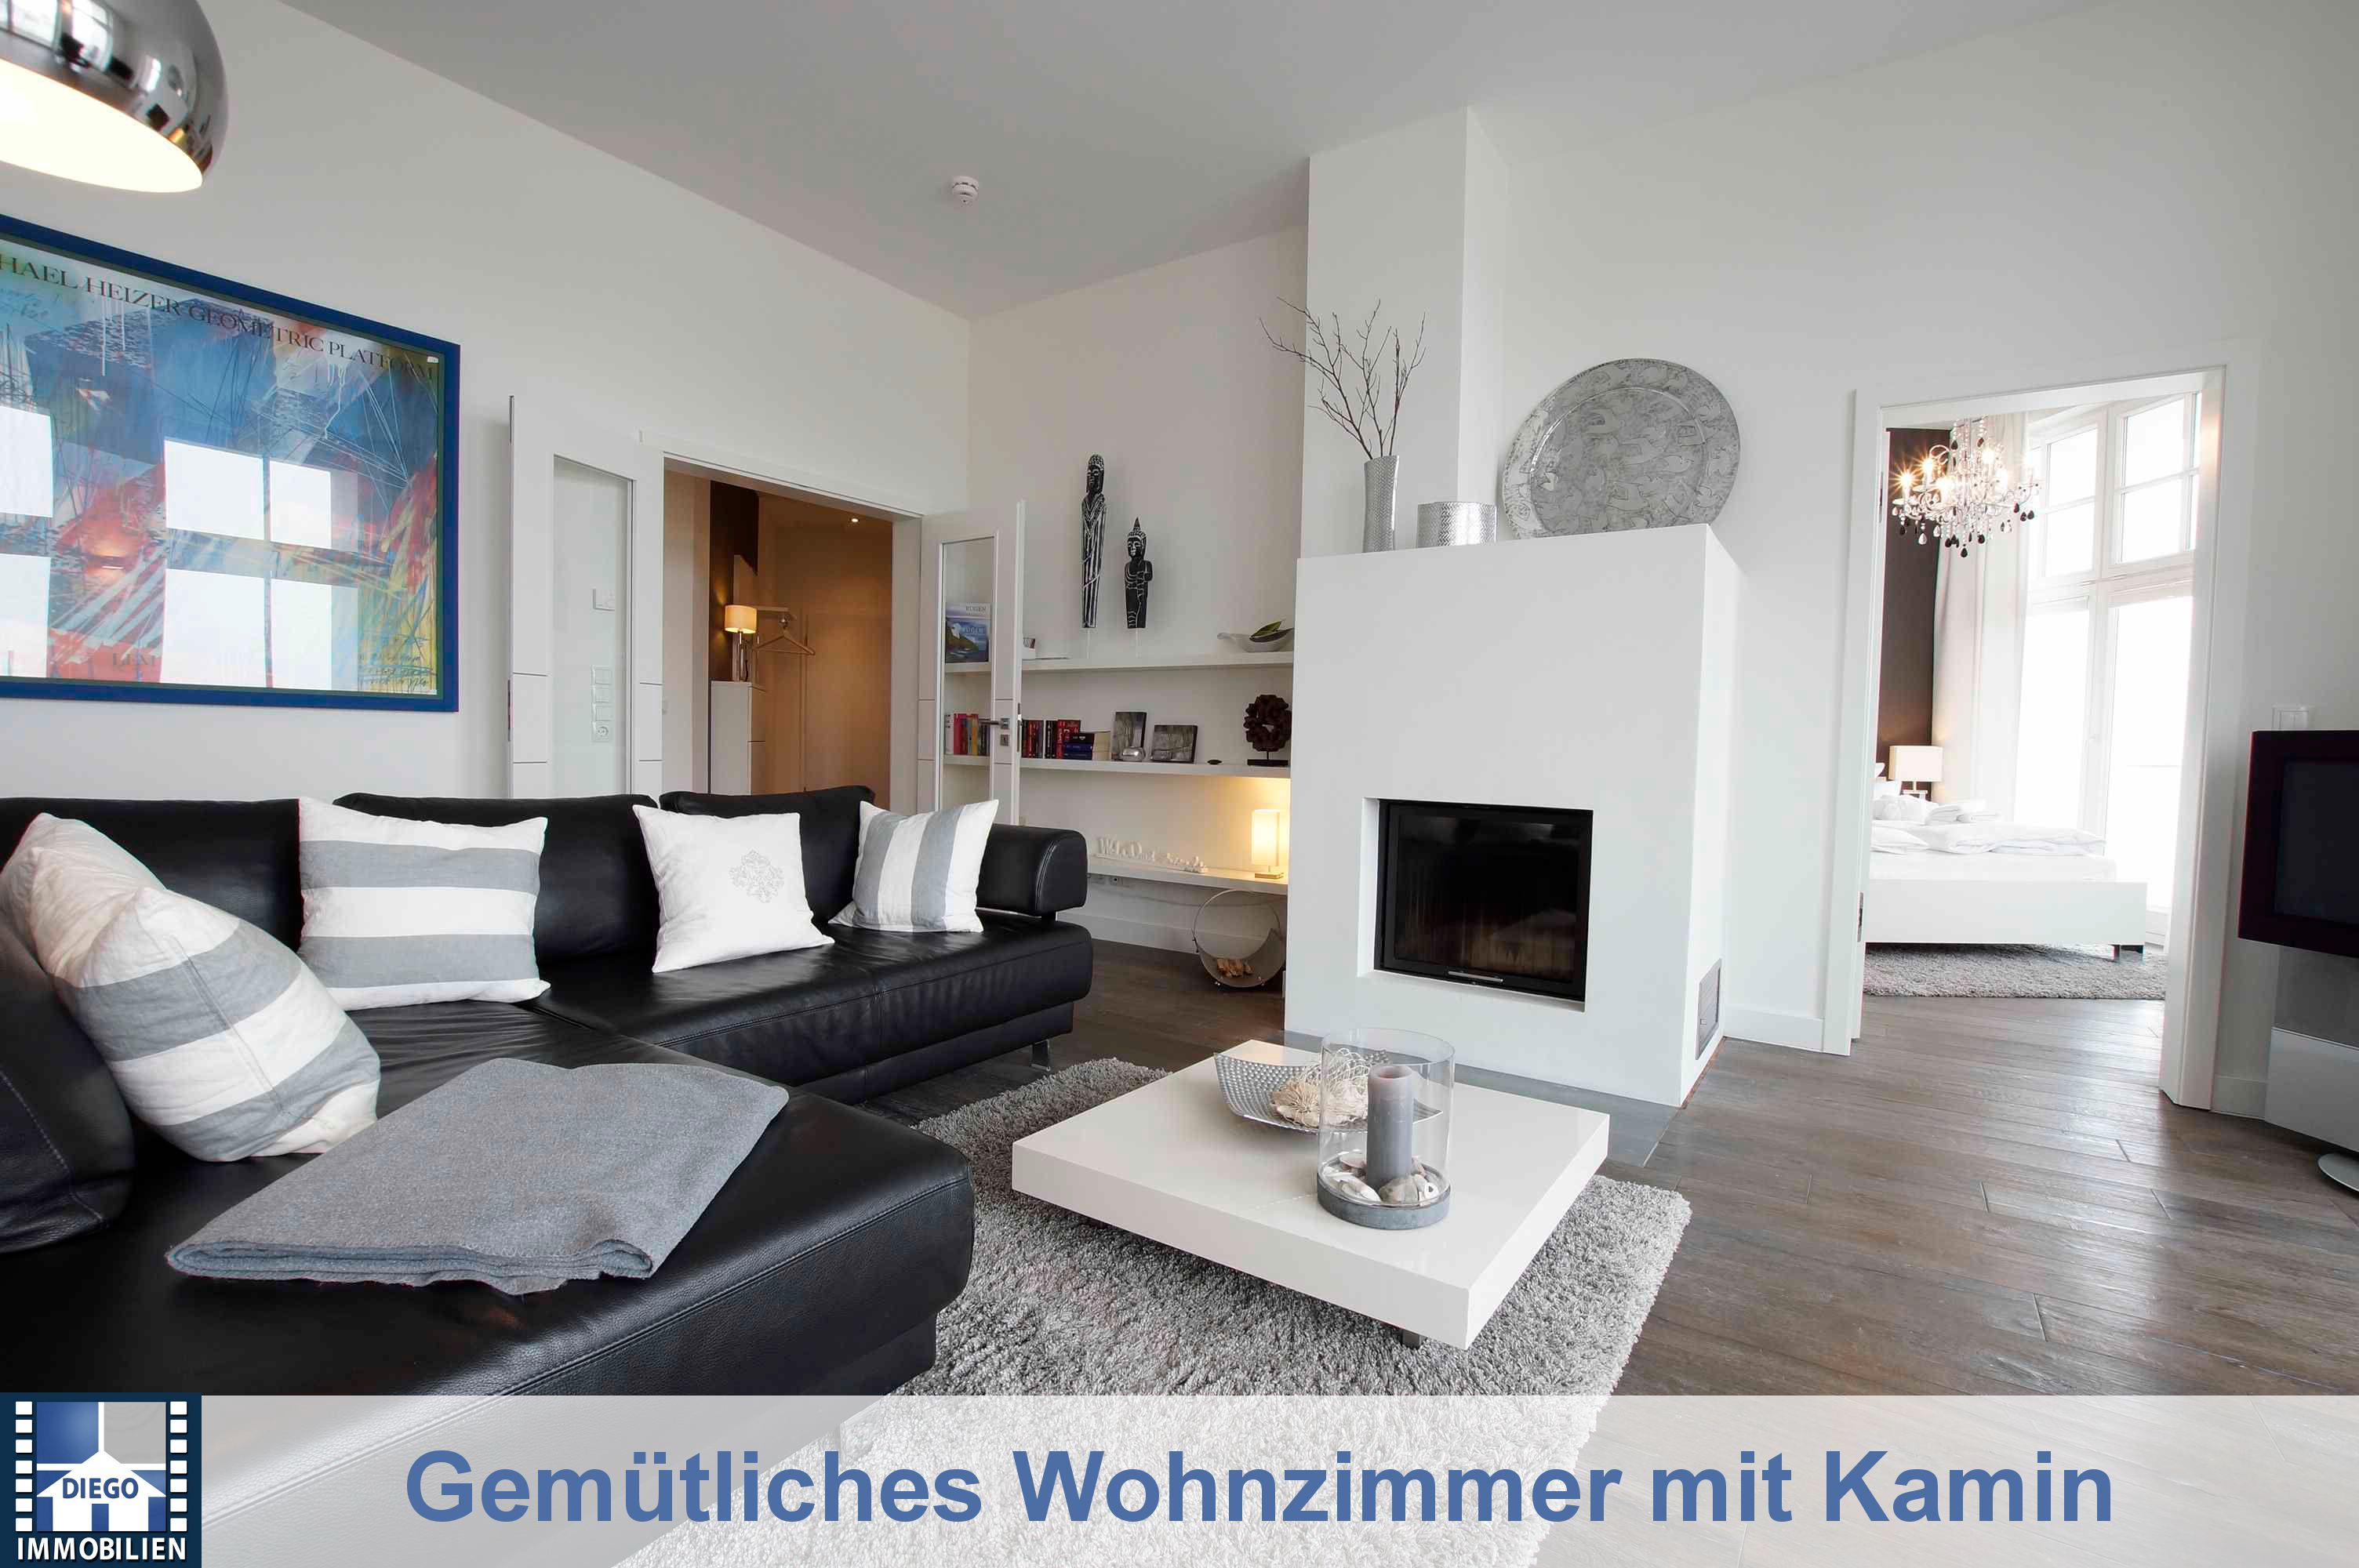 Kuschelalarm!!!! Http://diego Immobilien.de/ .